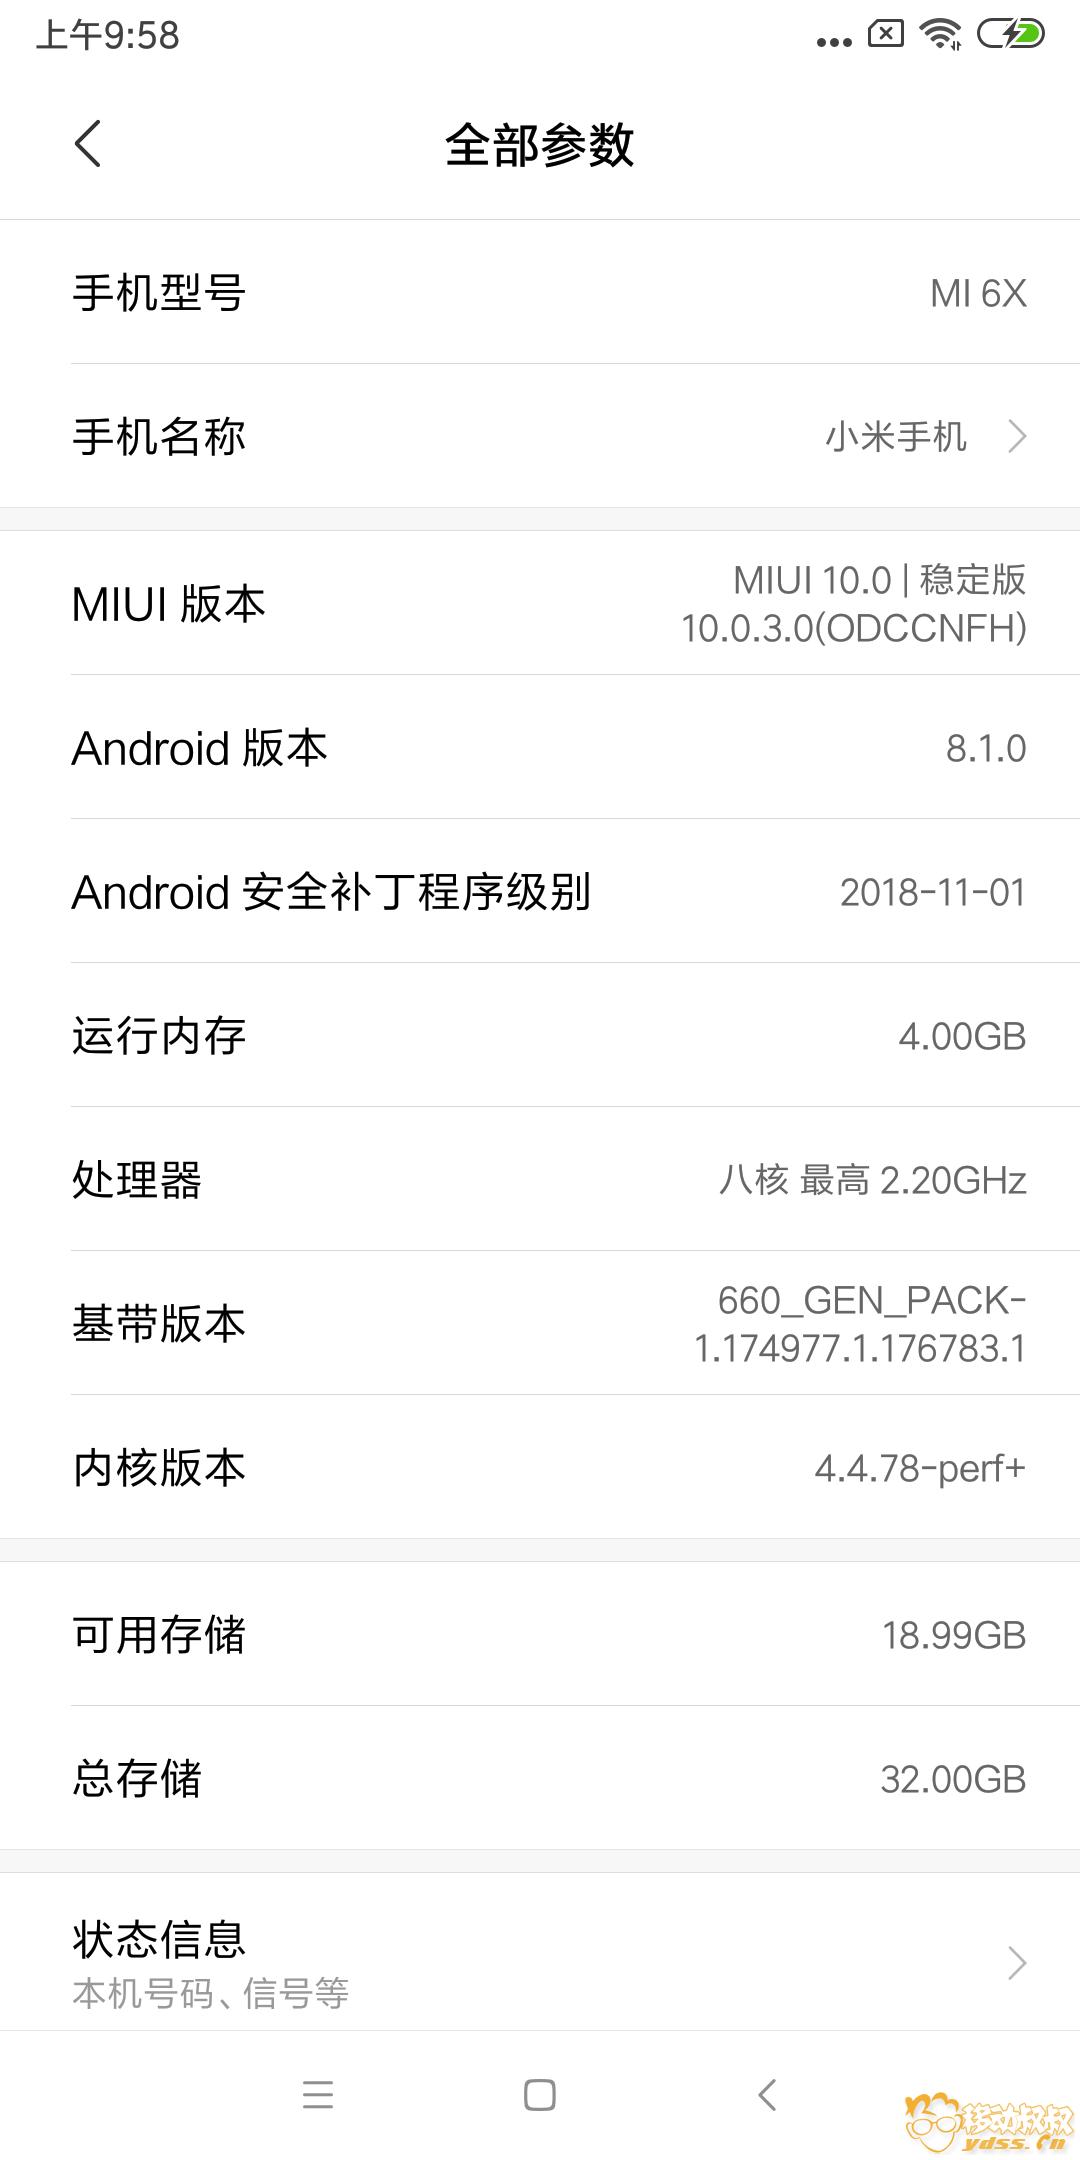 Screenshot_2018-12-06-09-58-30-597_com.android.settings.png